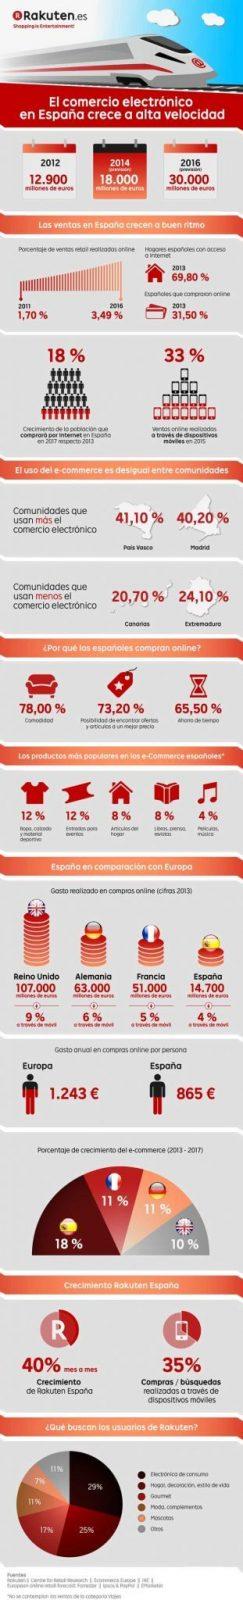 infografia comercio electronico rakuten